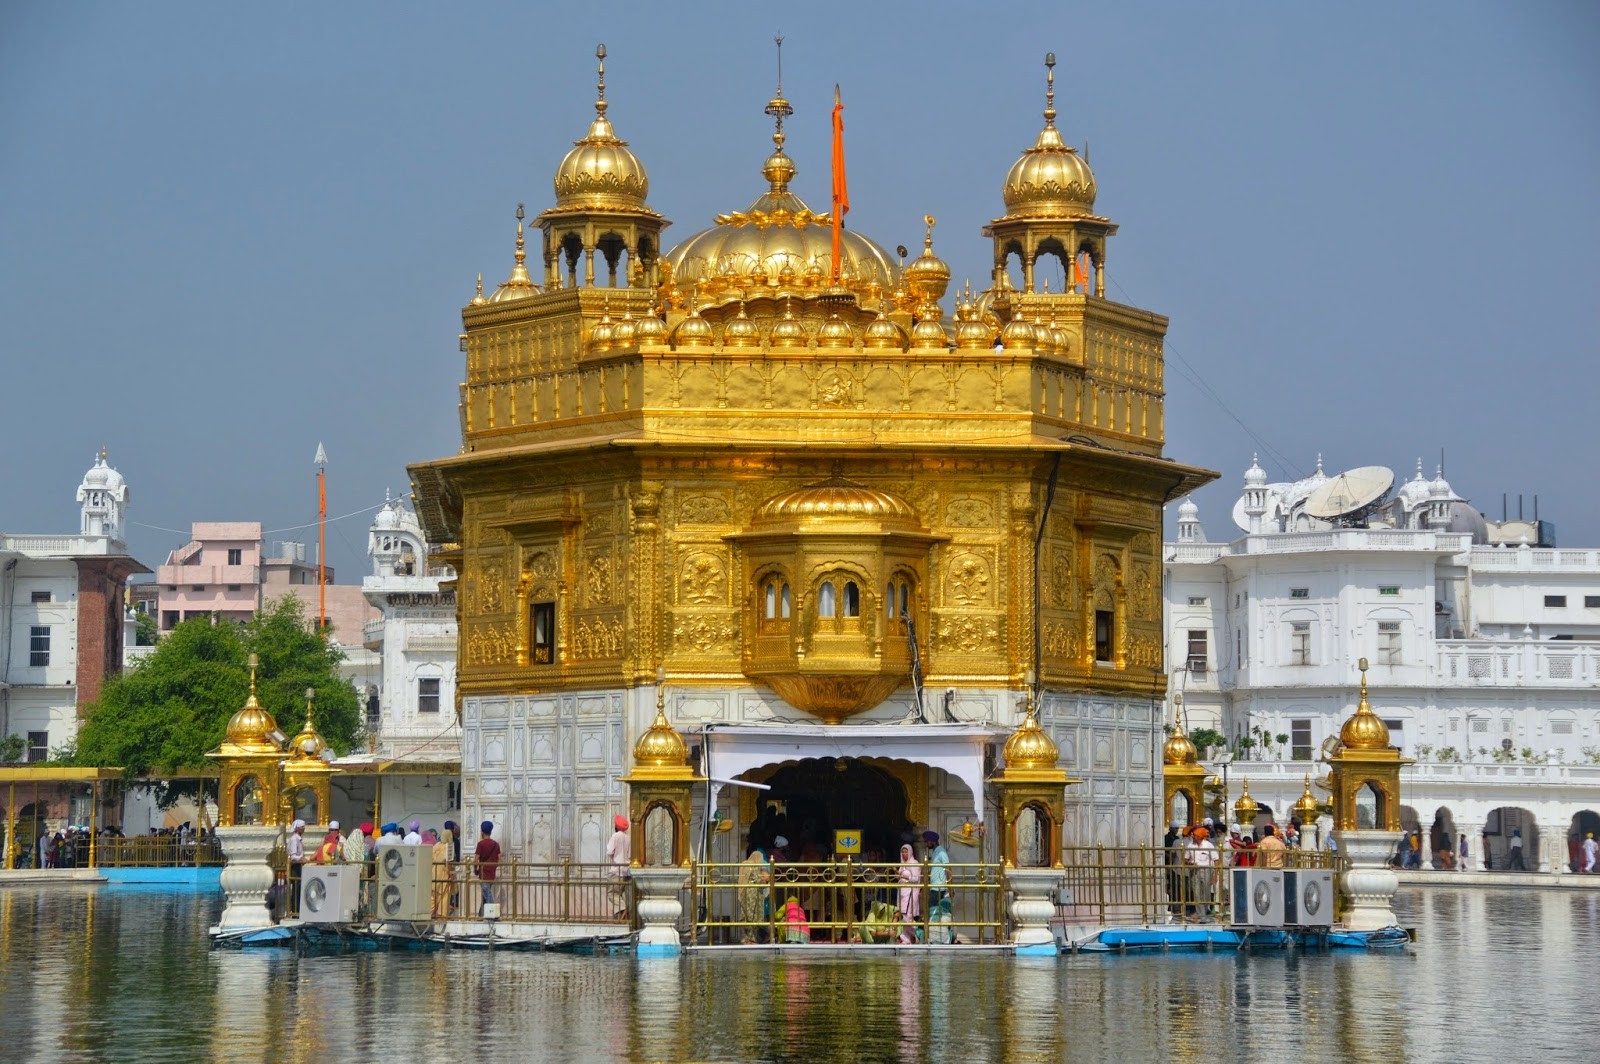 http://www.getbookcab.com/Admin/images/Amritsar.jpg